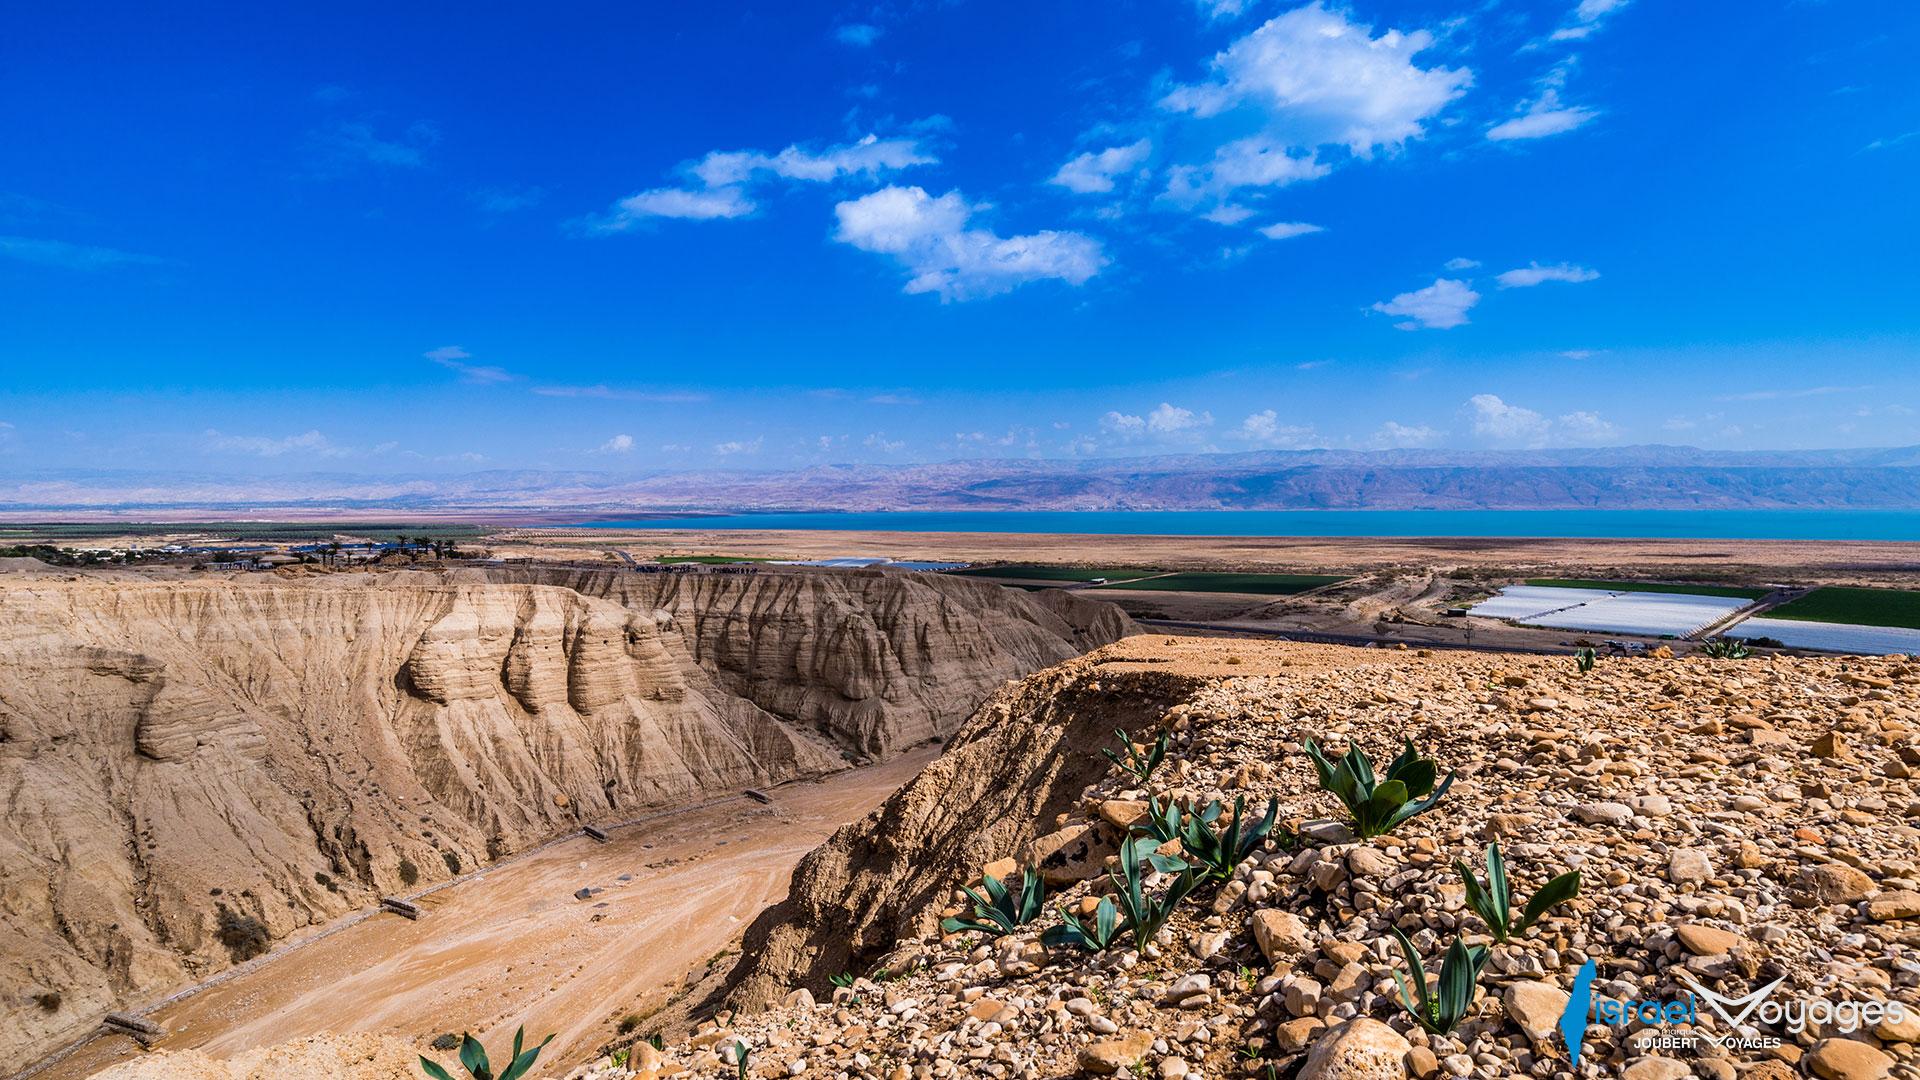 Grottes de Qumran face à la mer Morte